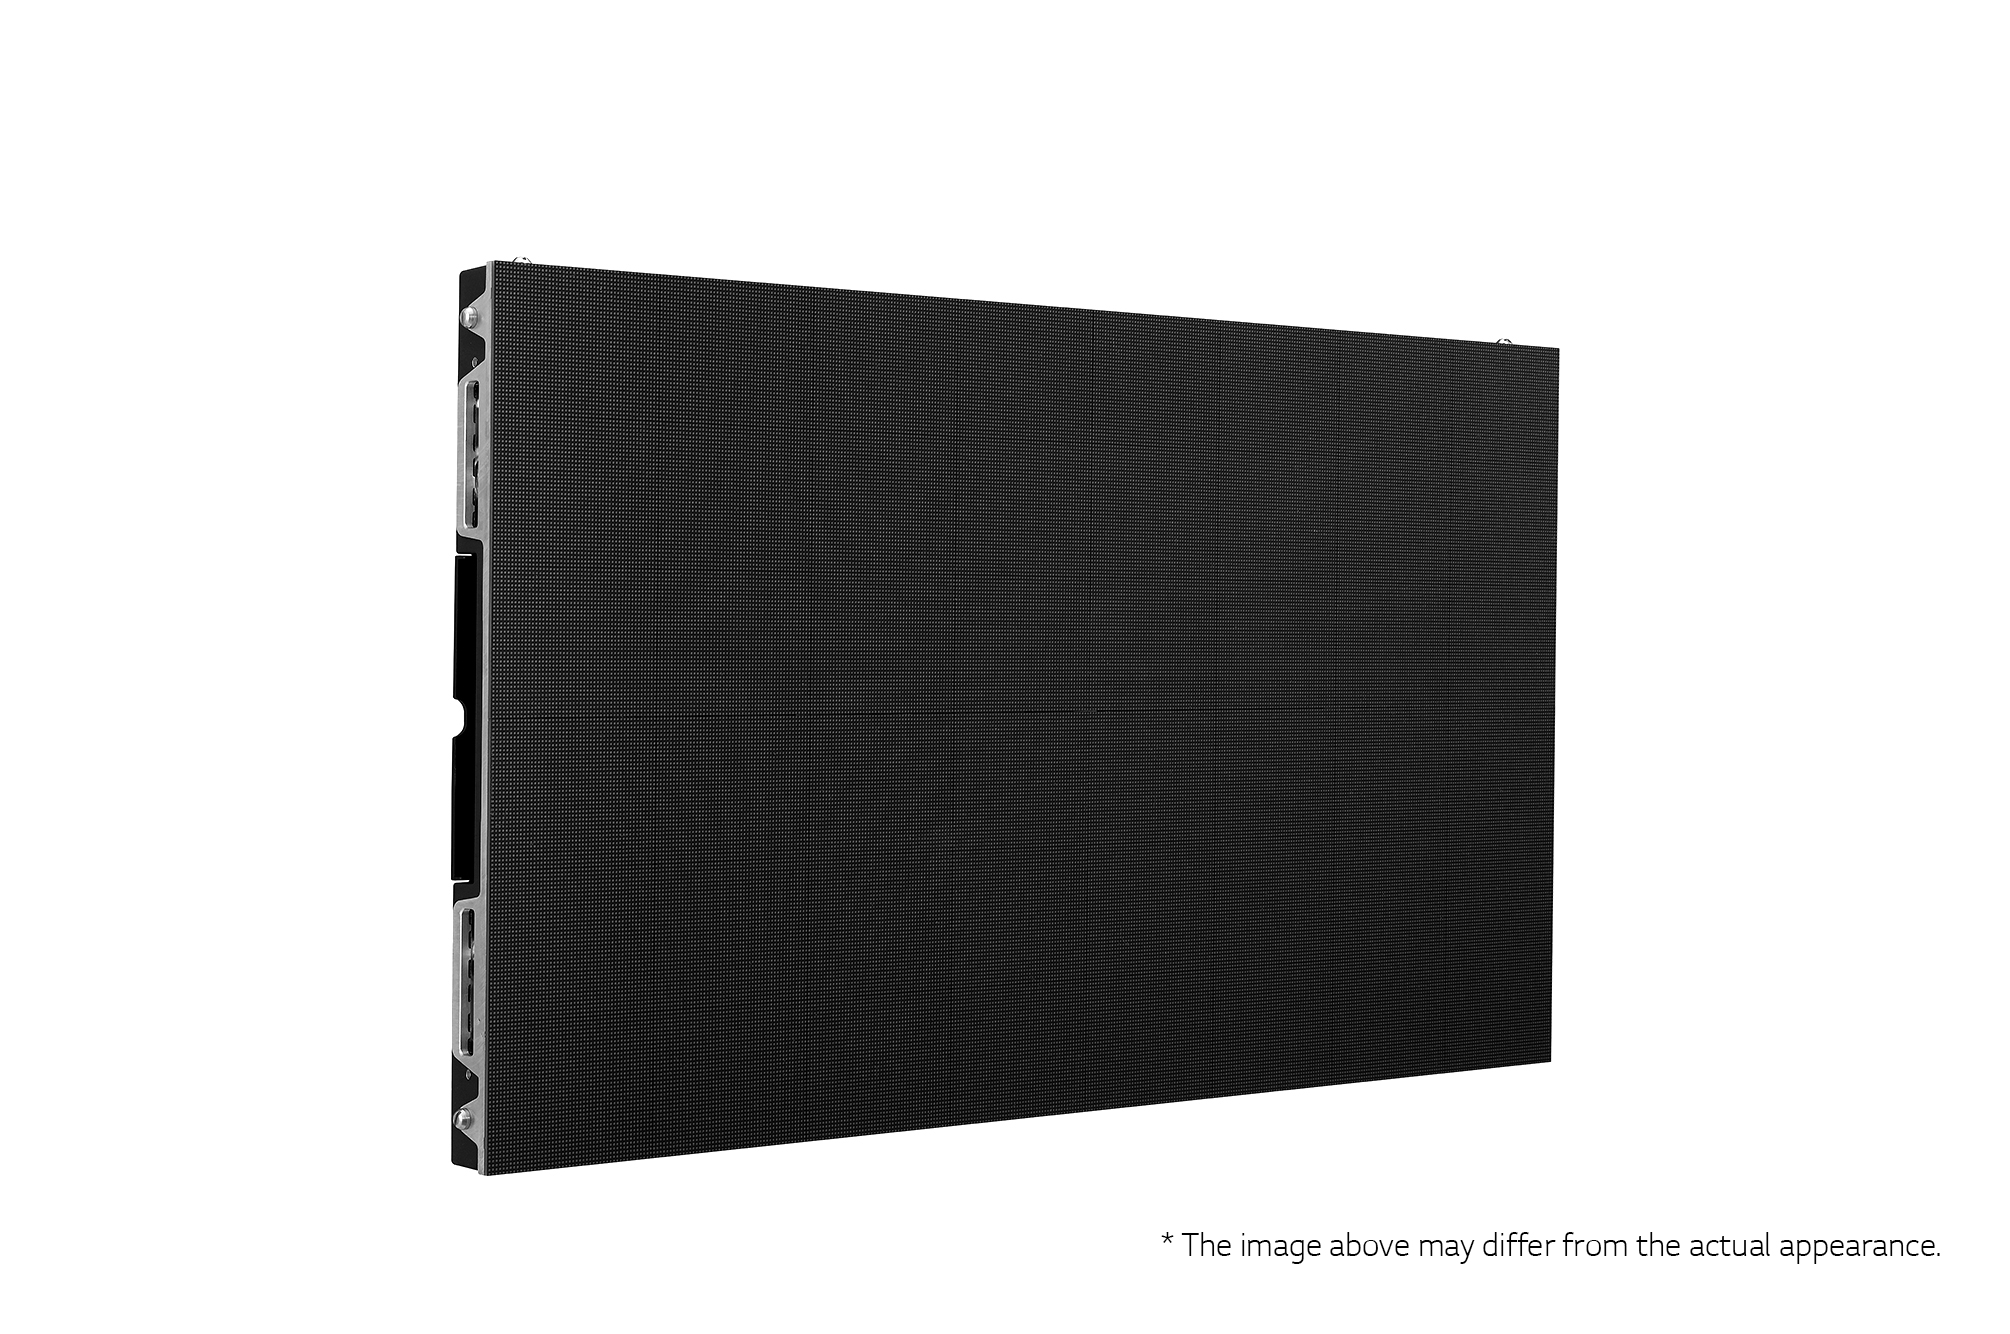 LG Ultra Slim LSCB025 5